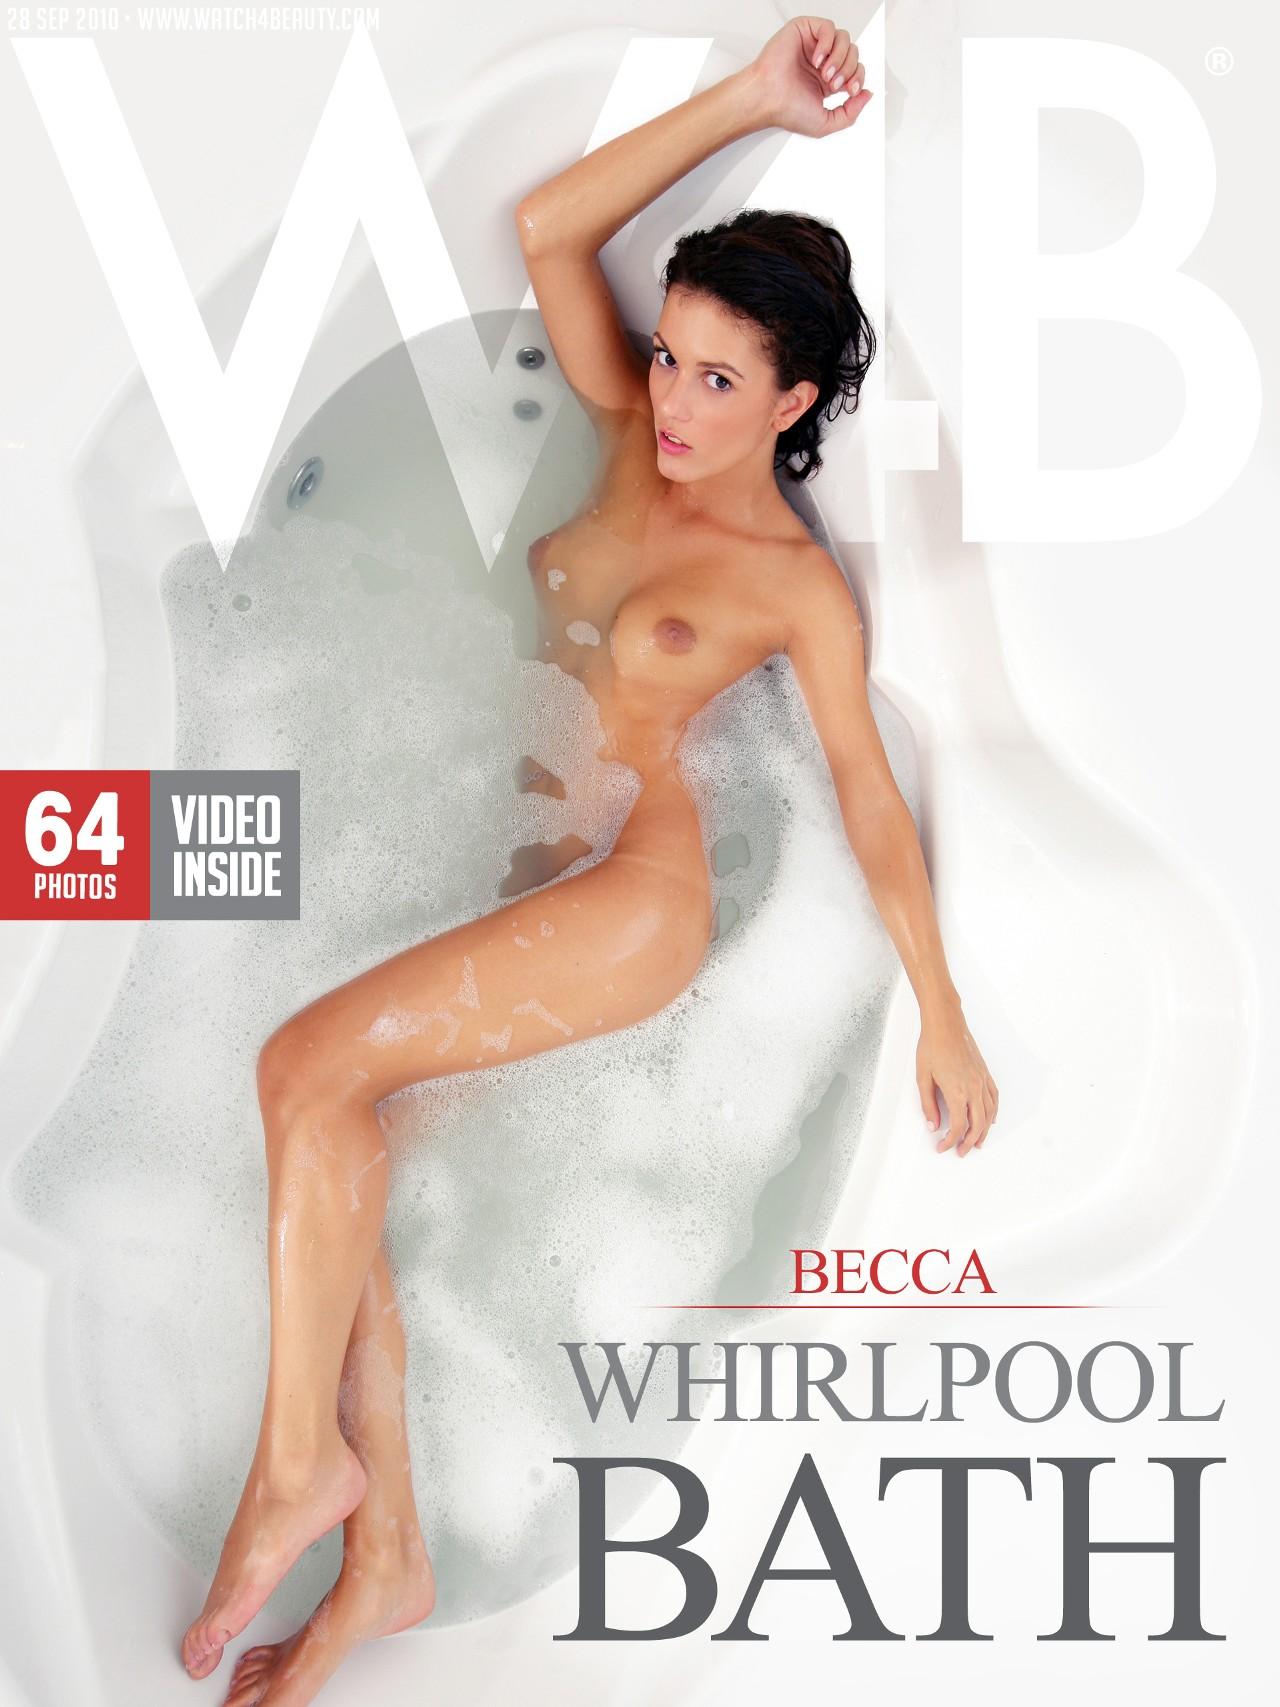 Becca: Whirlpool bath